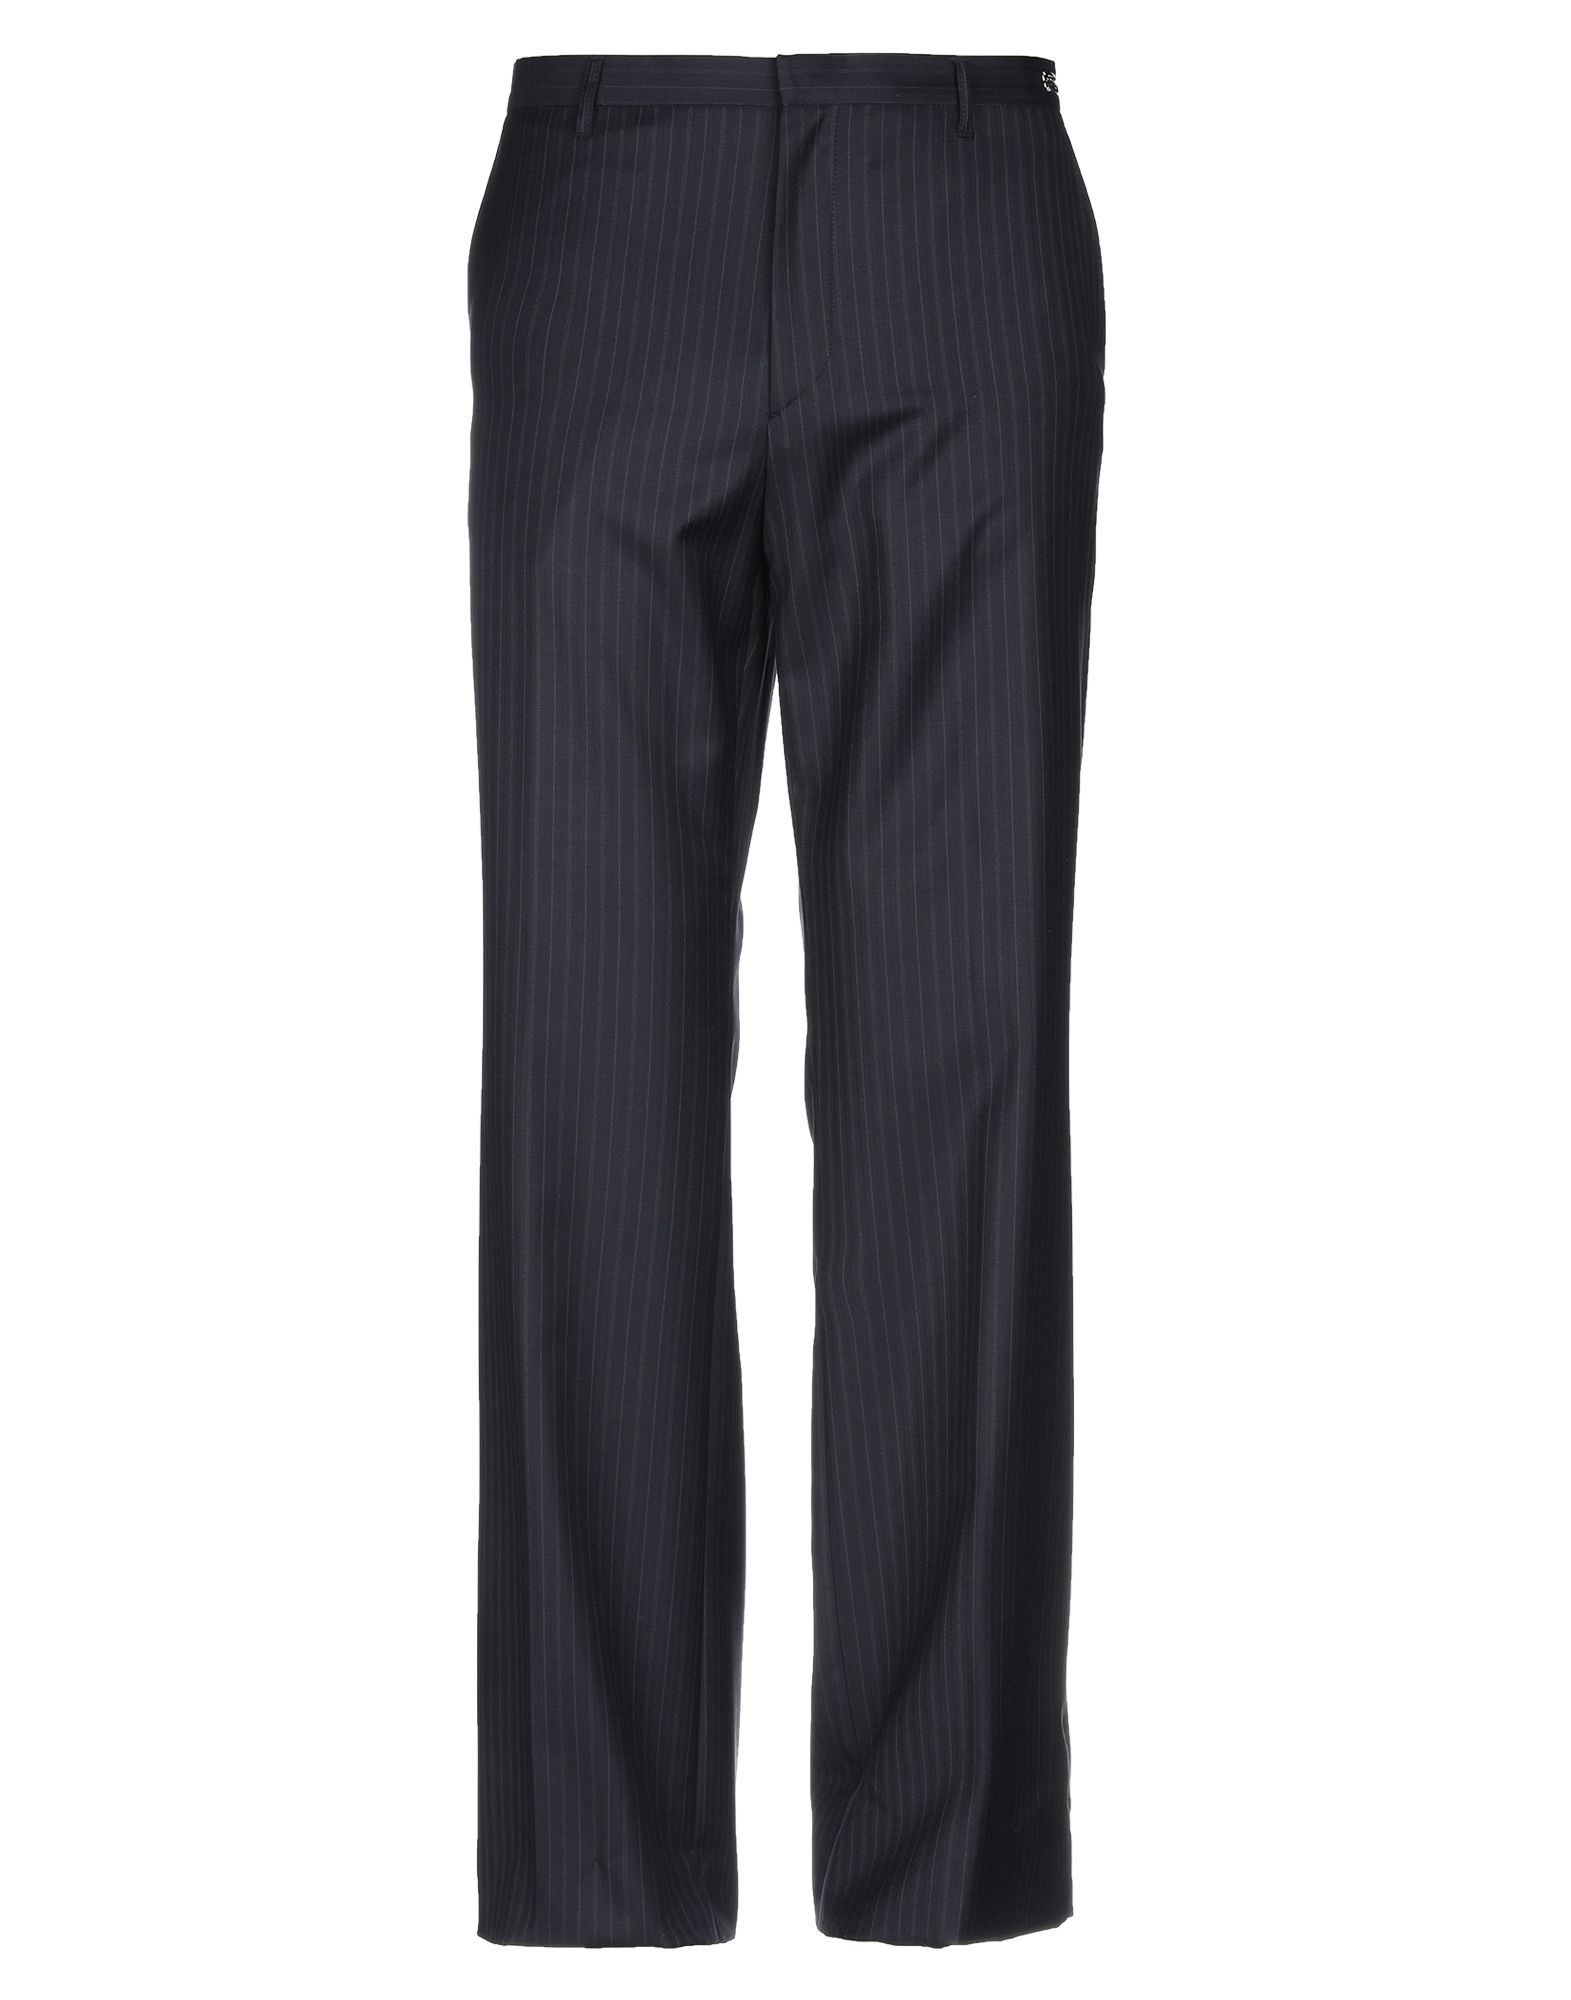 RICHMOND X Повседневные брюки adidas x yeezy повседневные брюки